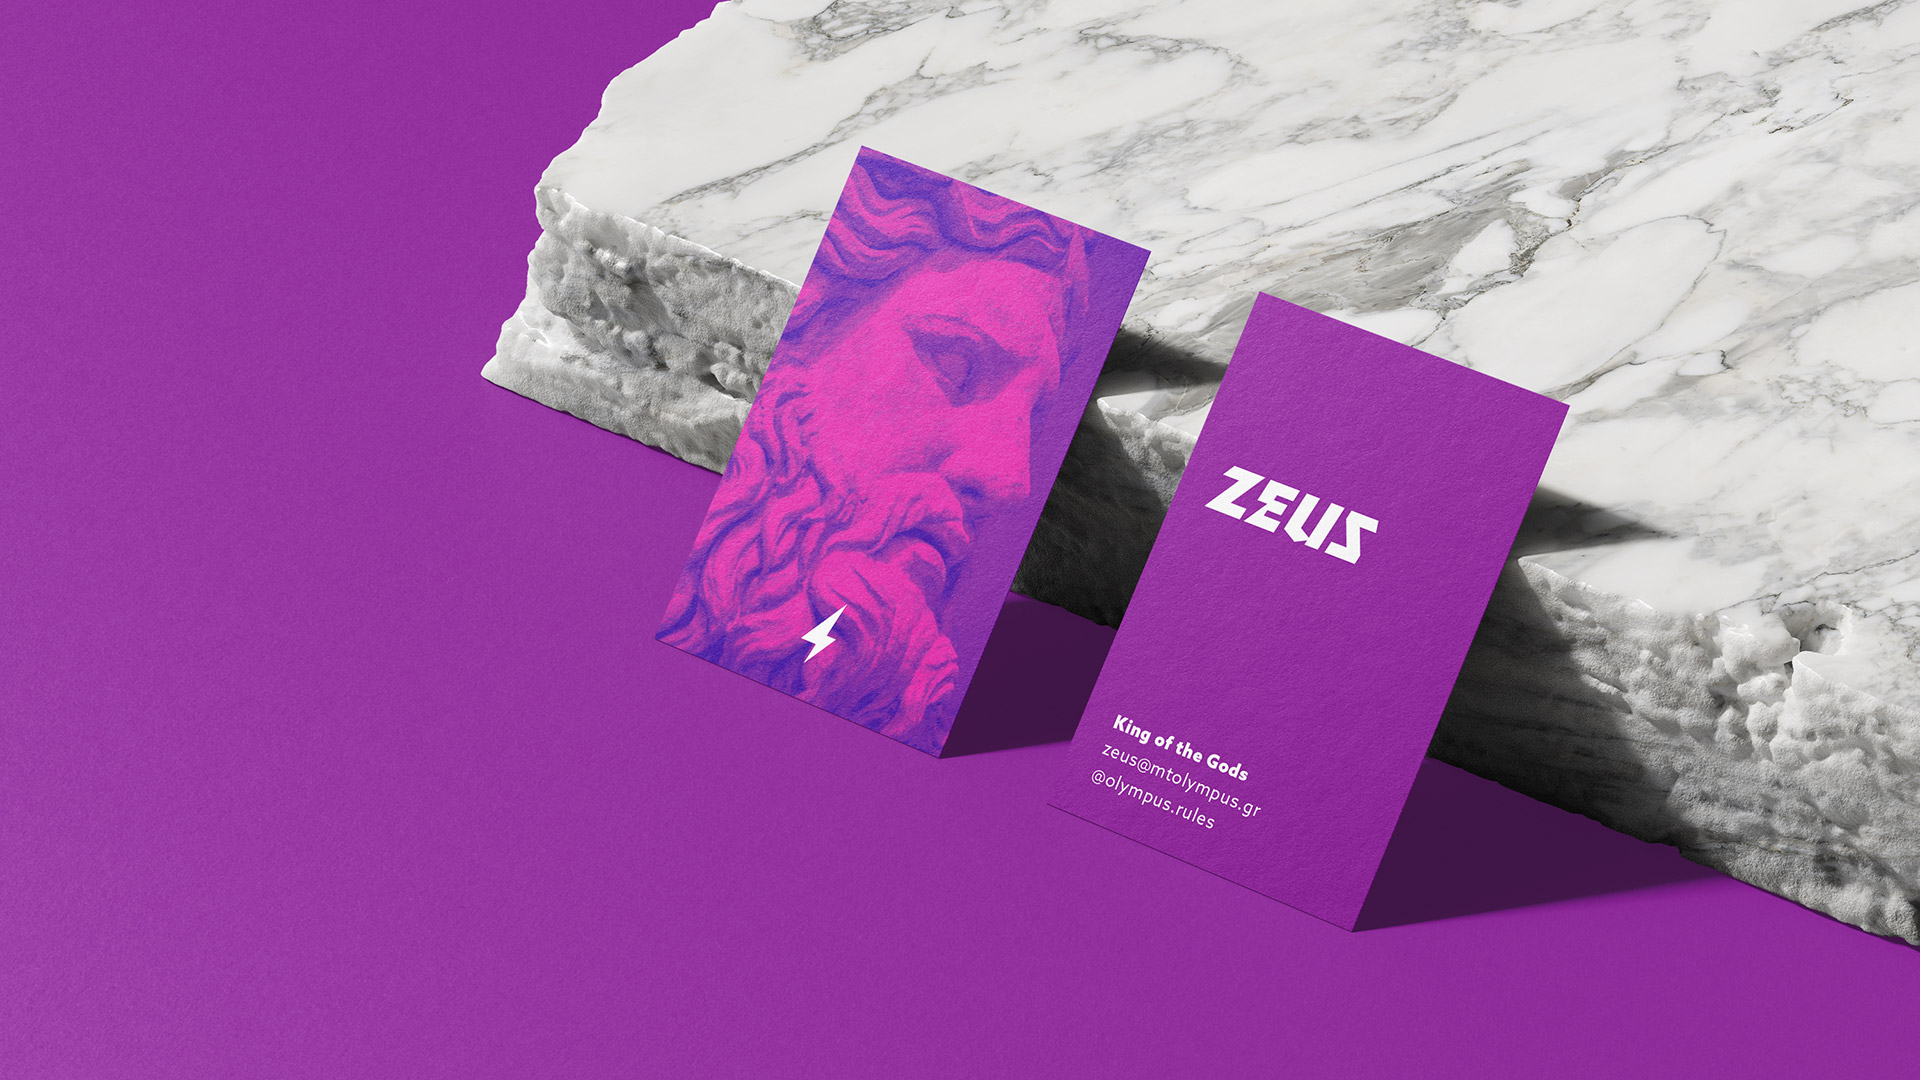 Zeus business card